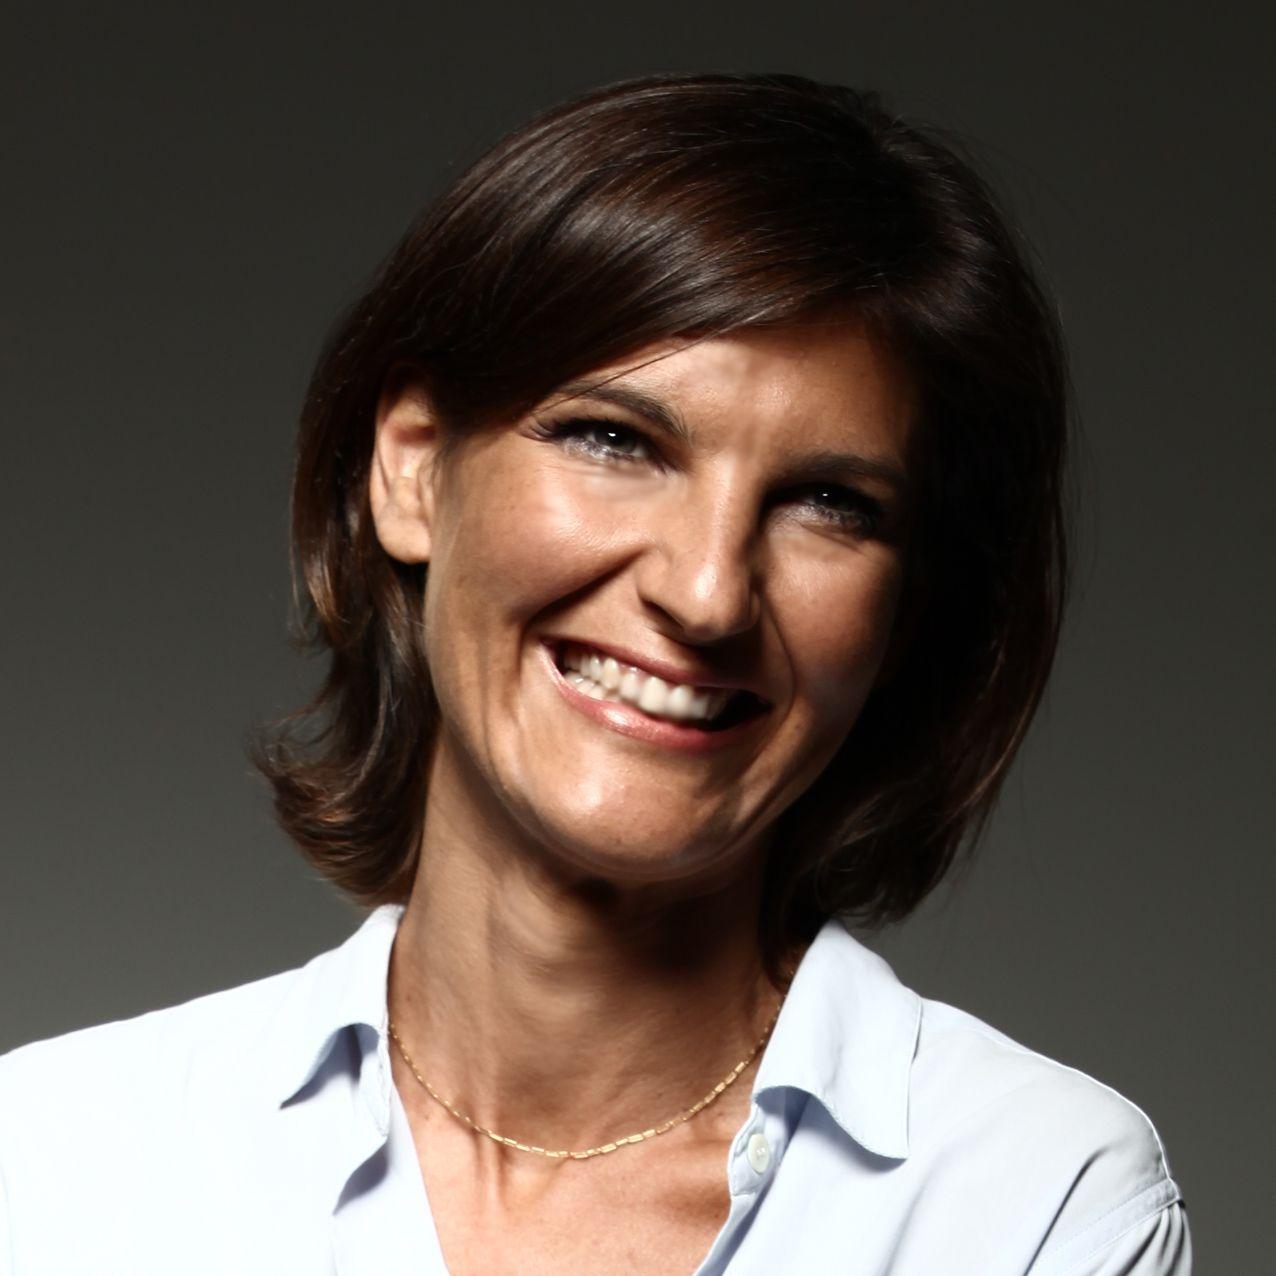 Claire Fouquerand